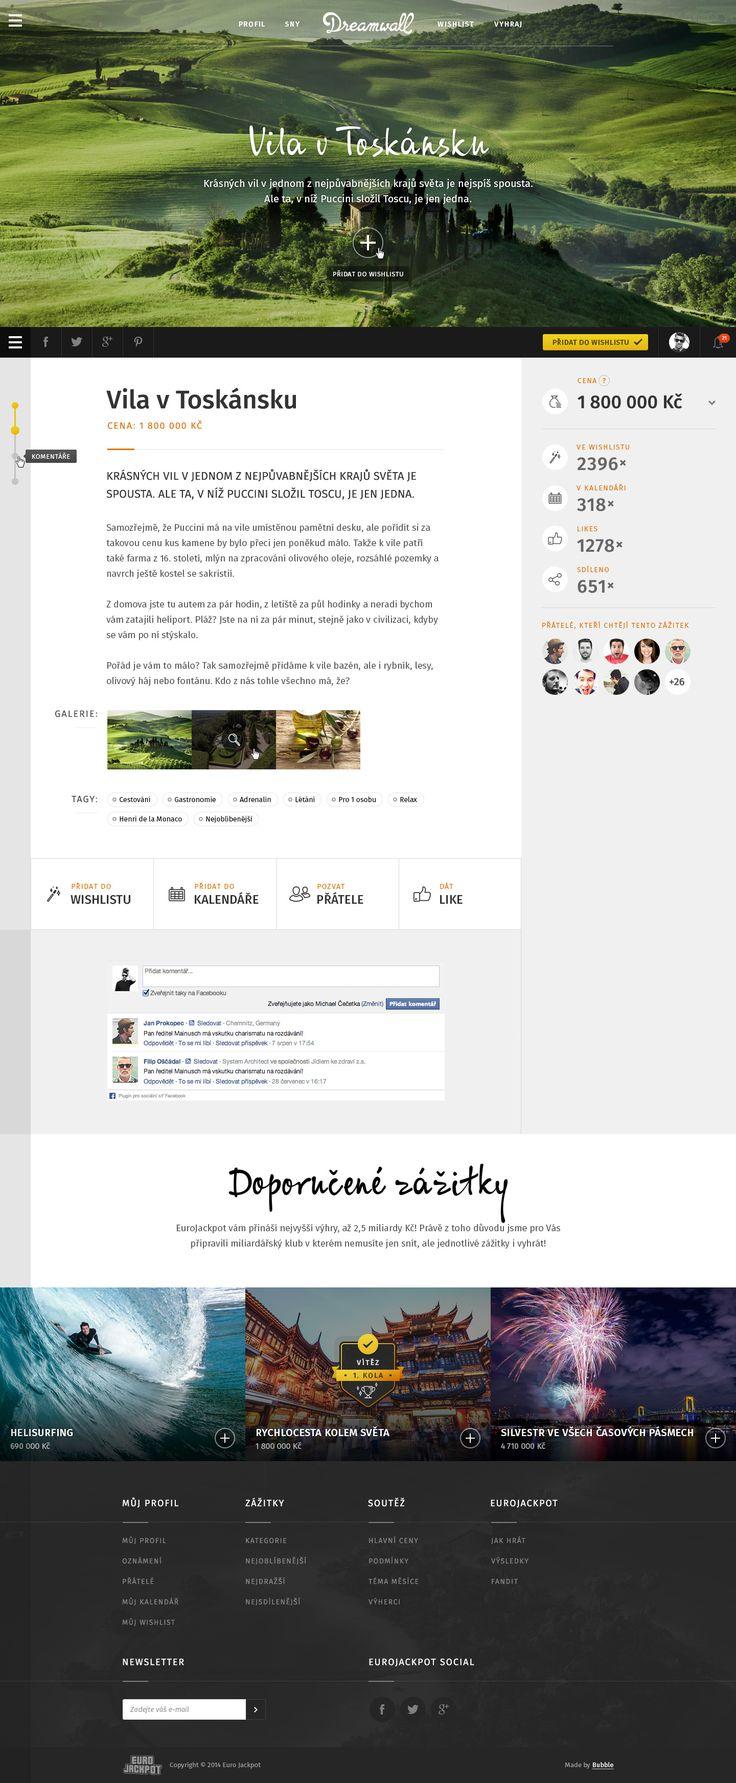 Dribbble social app ui design jpg by ramotion - Dribbble 01 Detail Jpg By Michael E Etka